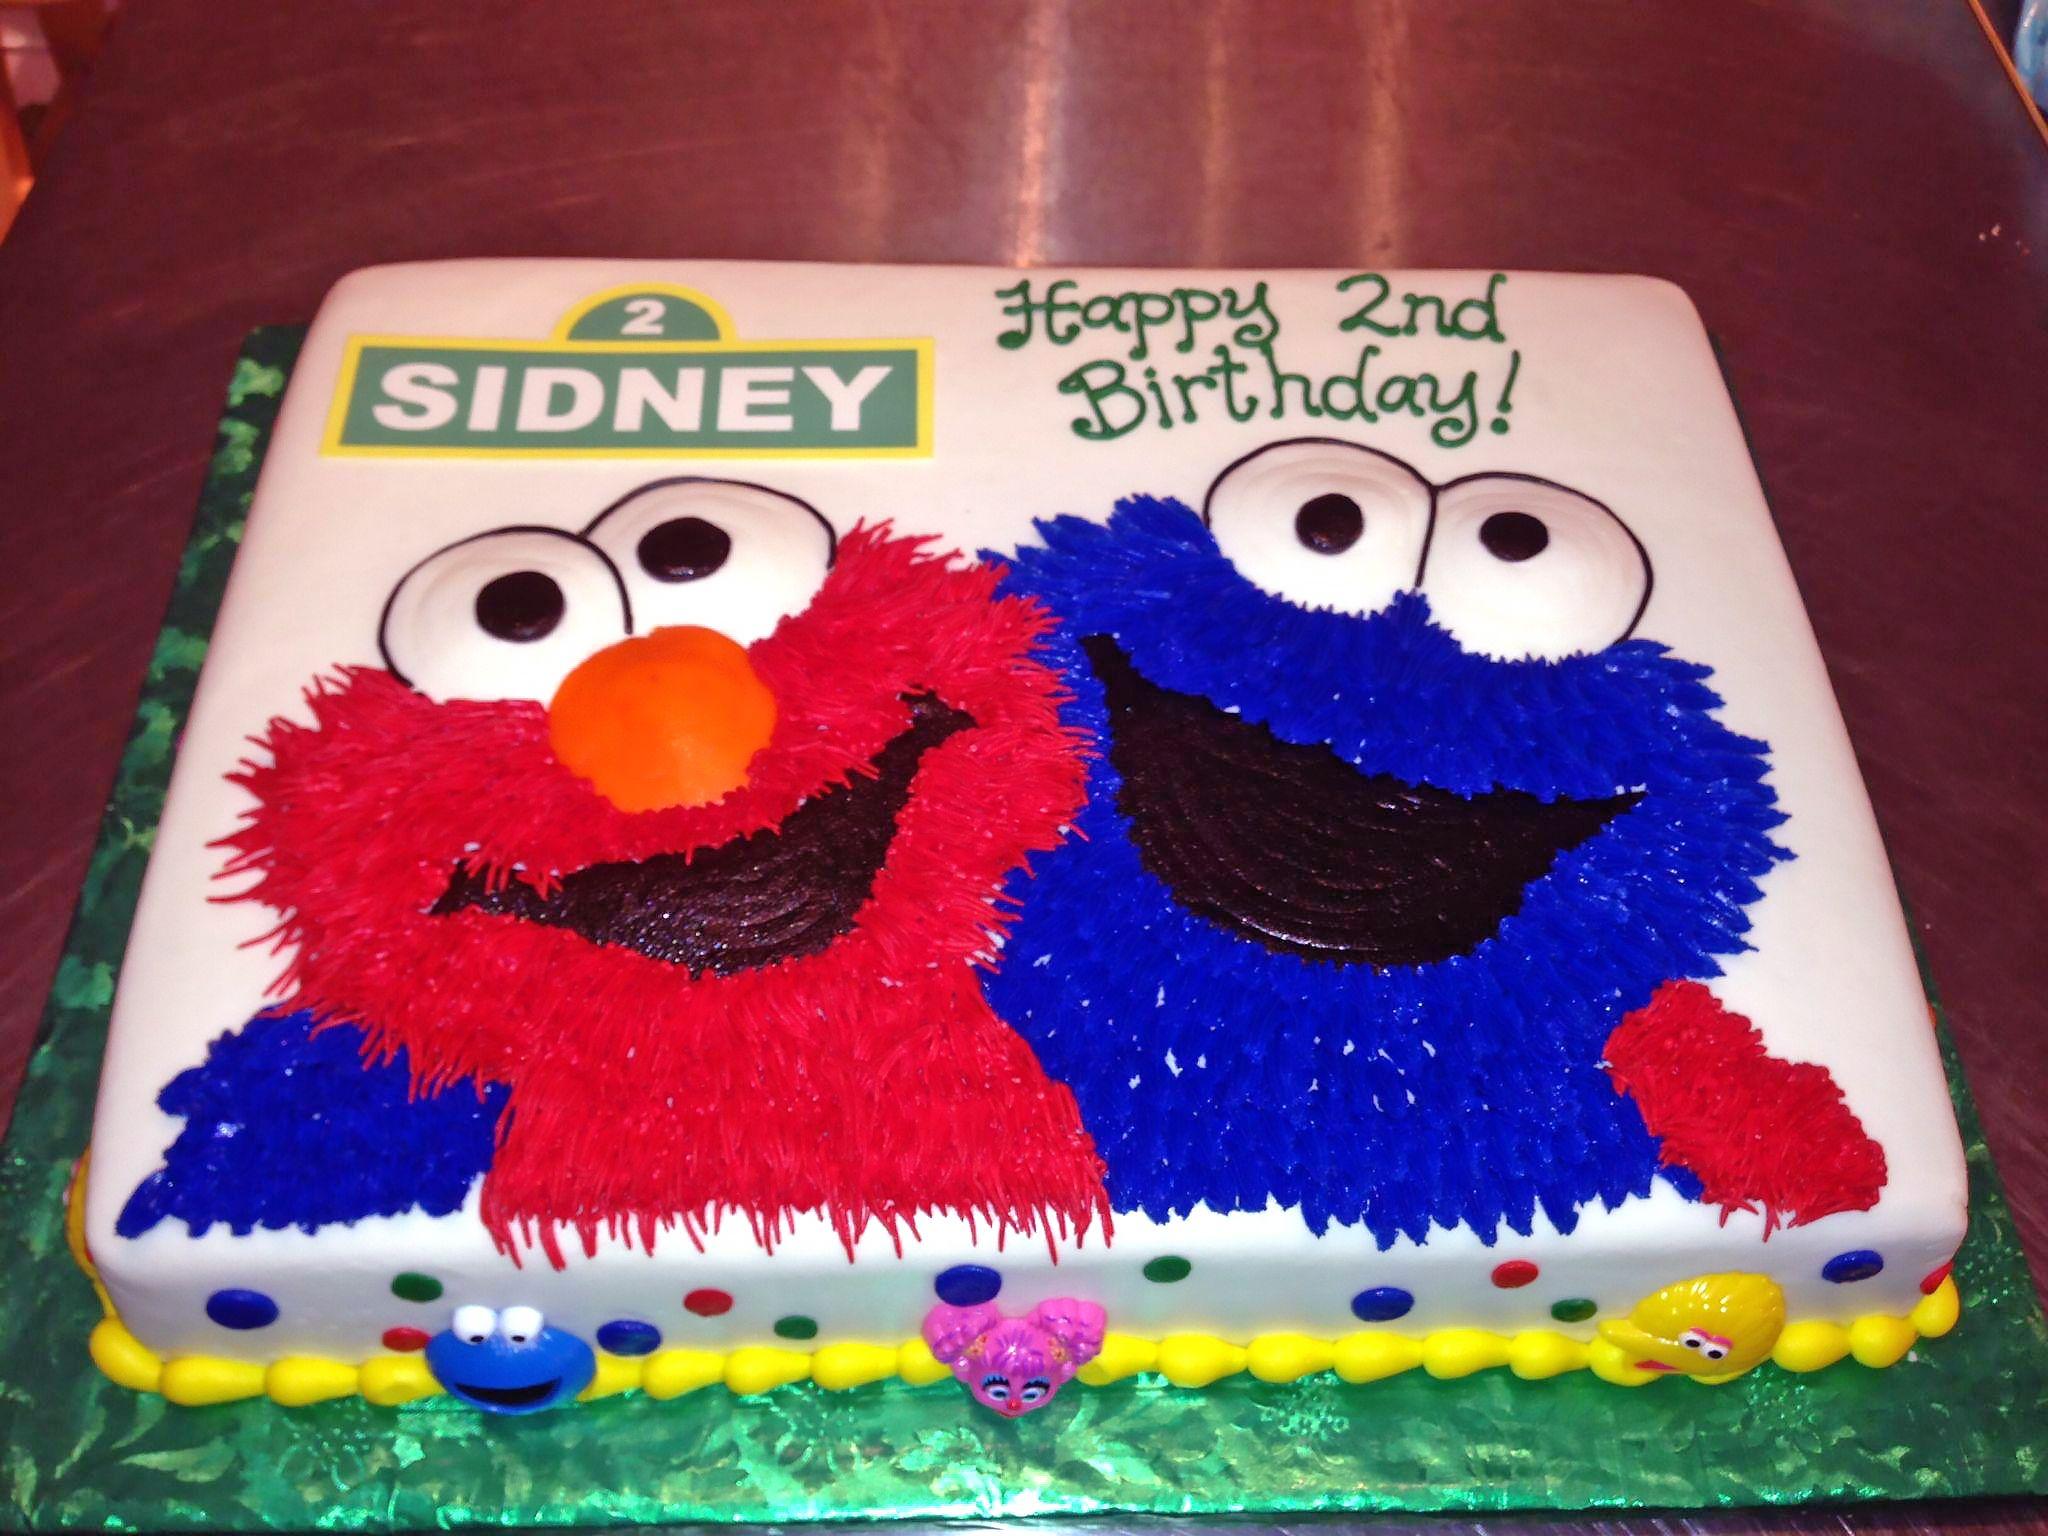 2nd Birthday Cake Cookie Monster Elmo Kids Sesame Street